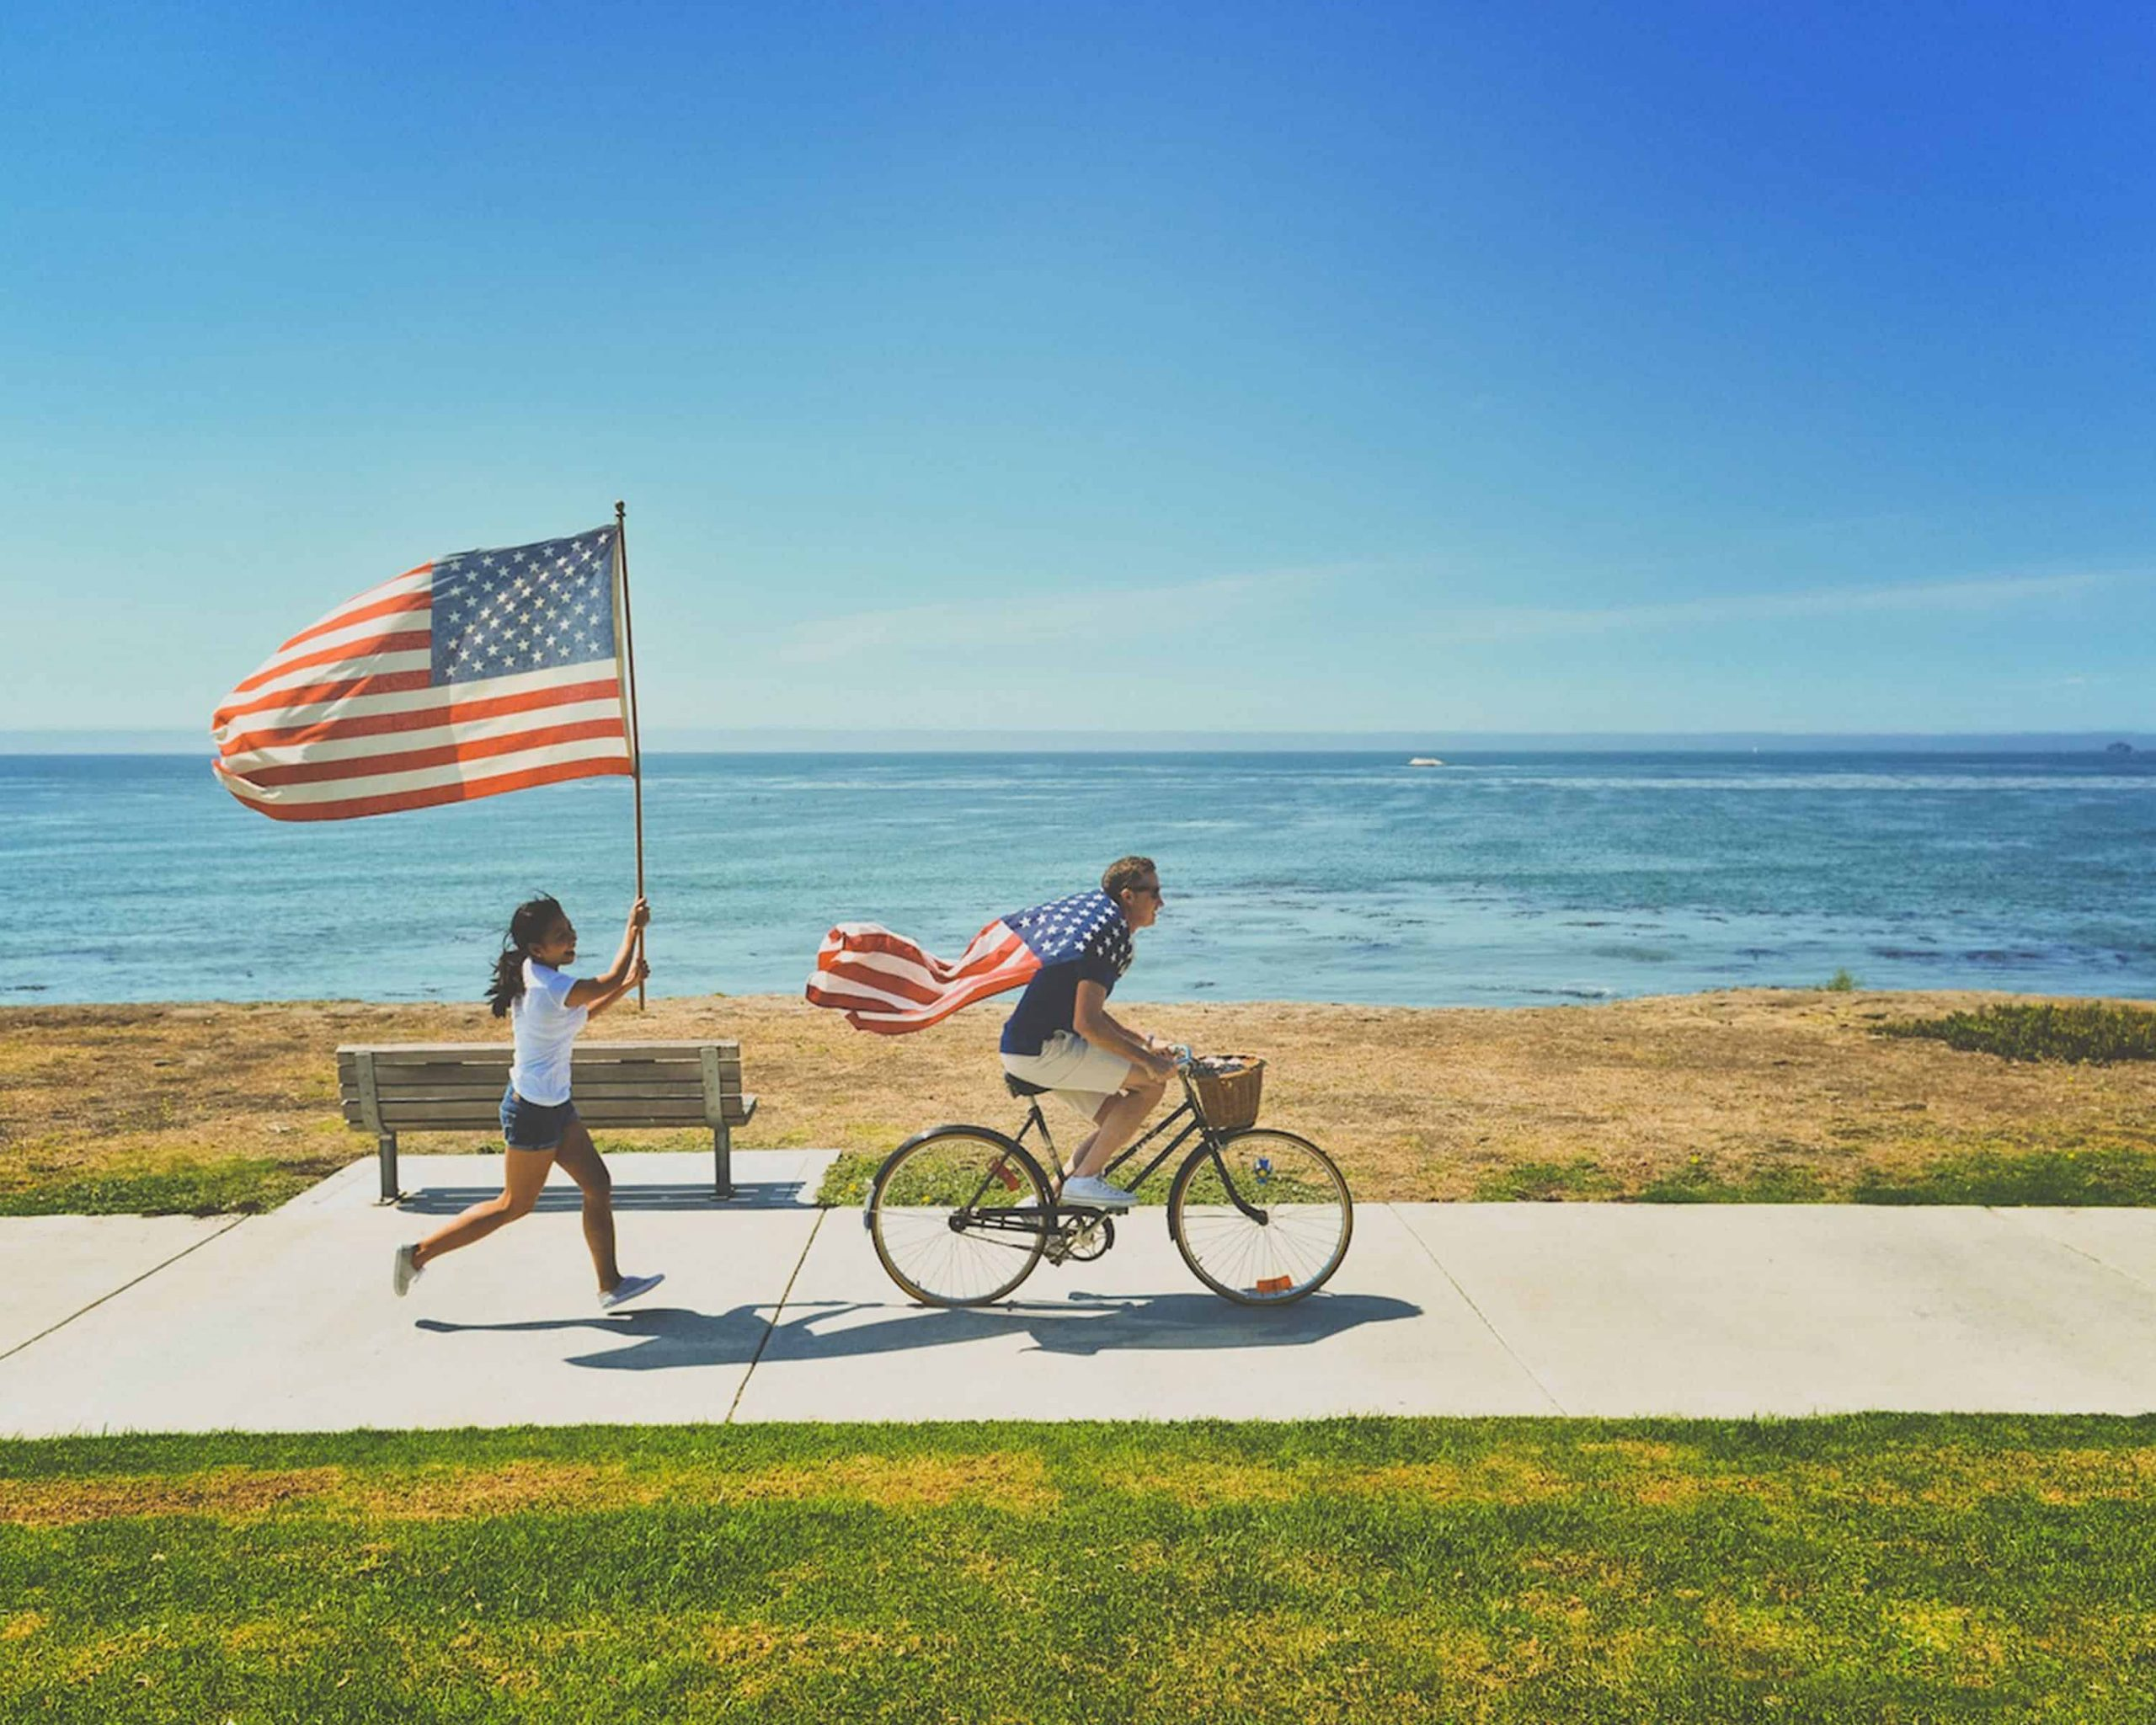 You are currently viewing 15 endroits à visiter aux États-Unis